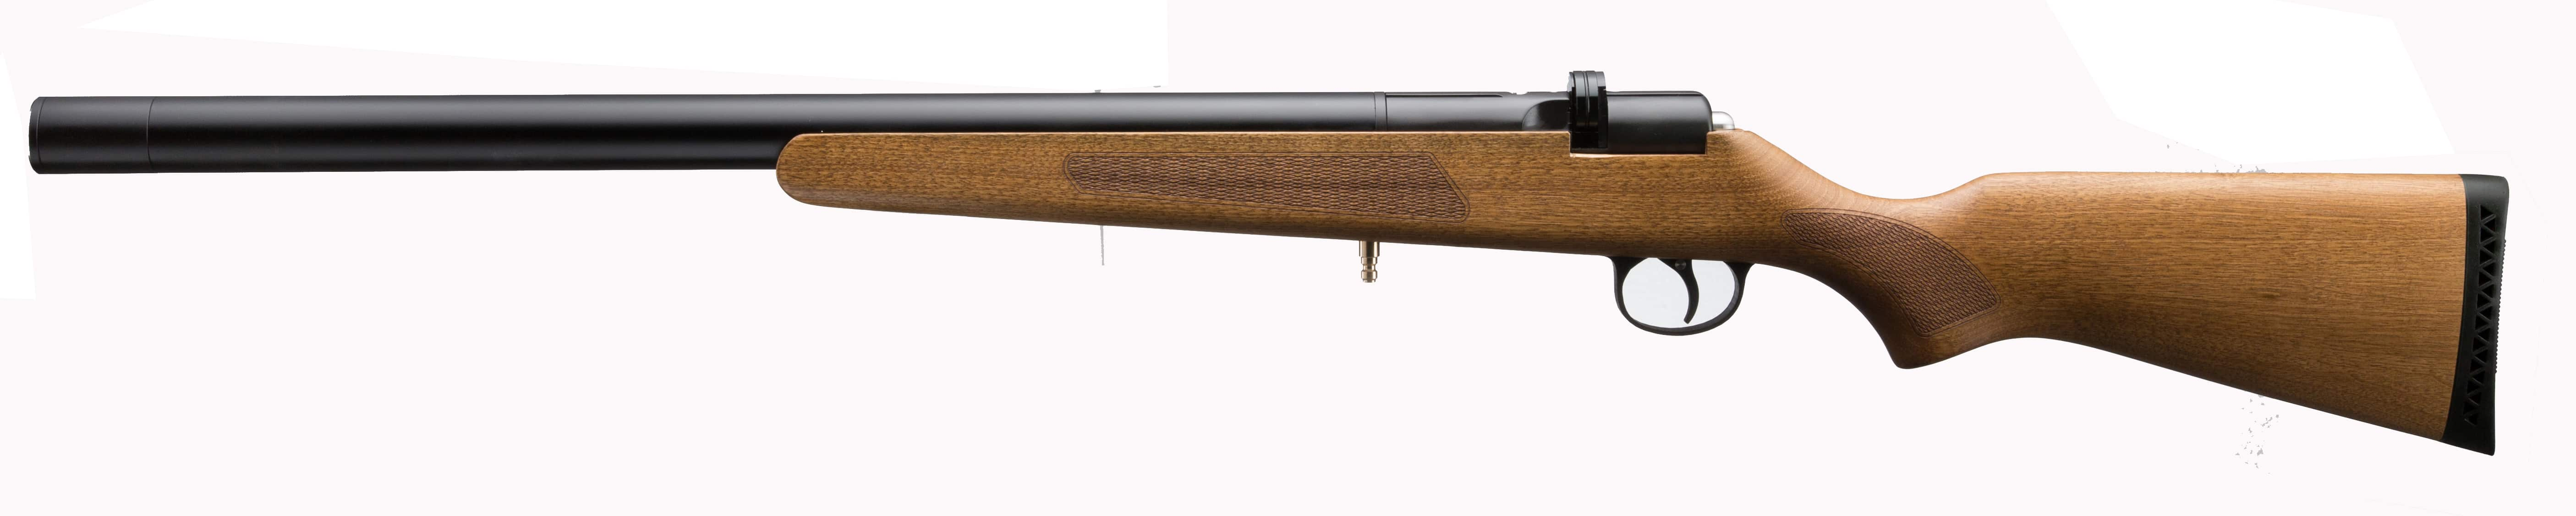 Artemis M30 Air Rifle